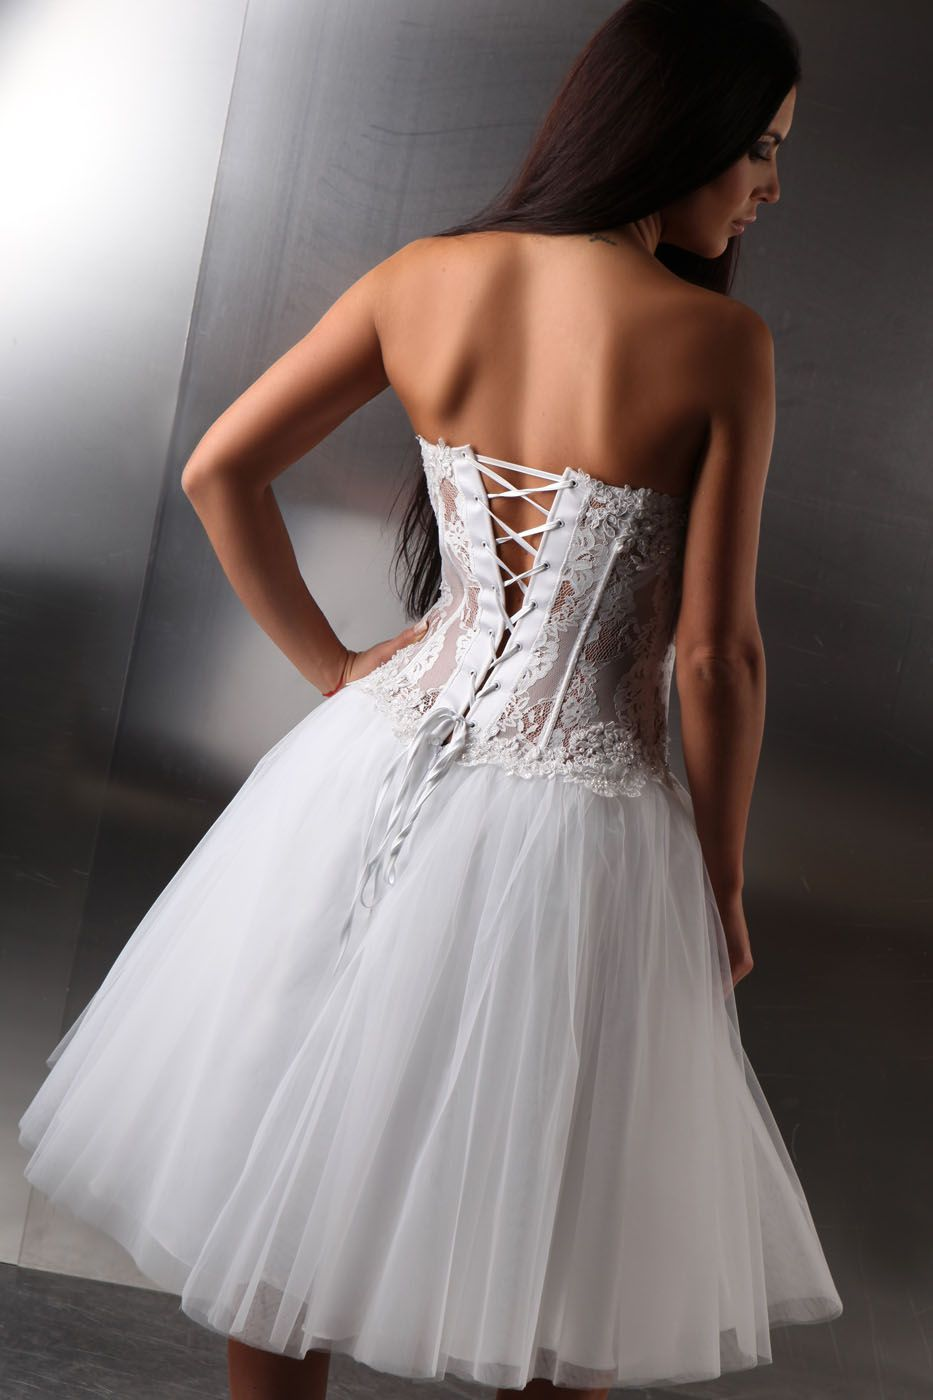 petticoat brautkleid t llrock 50er jahre brautmode standesamt kleiderfreuden. Black Bedroom Furniture Sets. Home Design Ideas